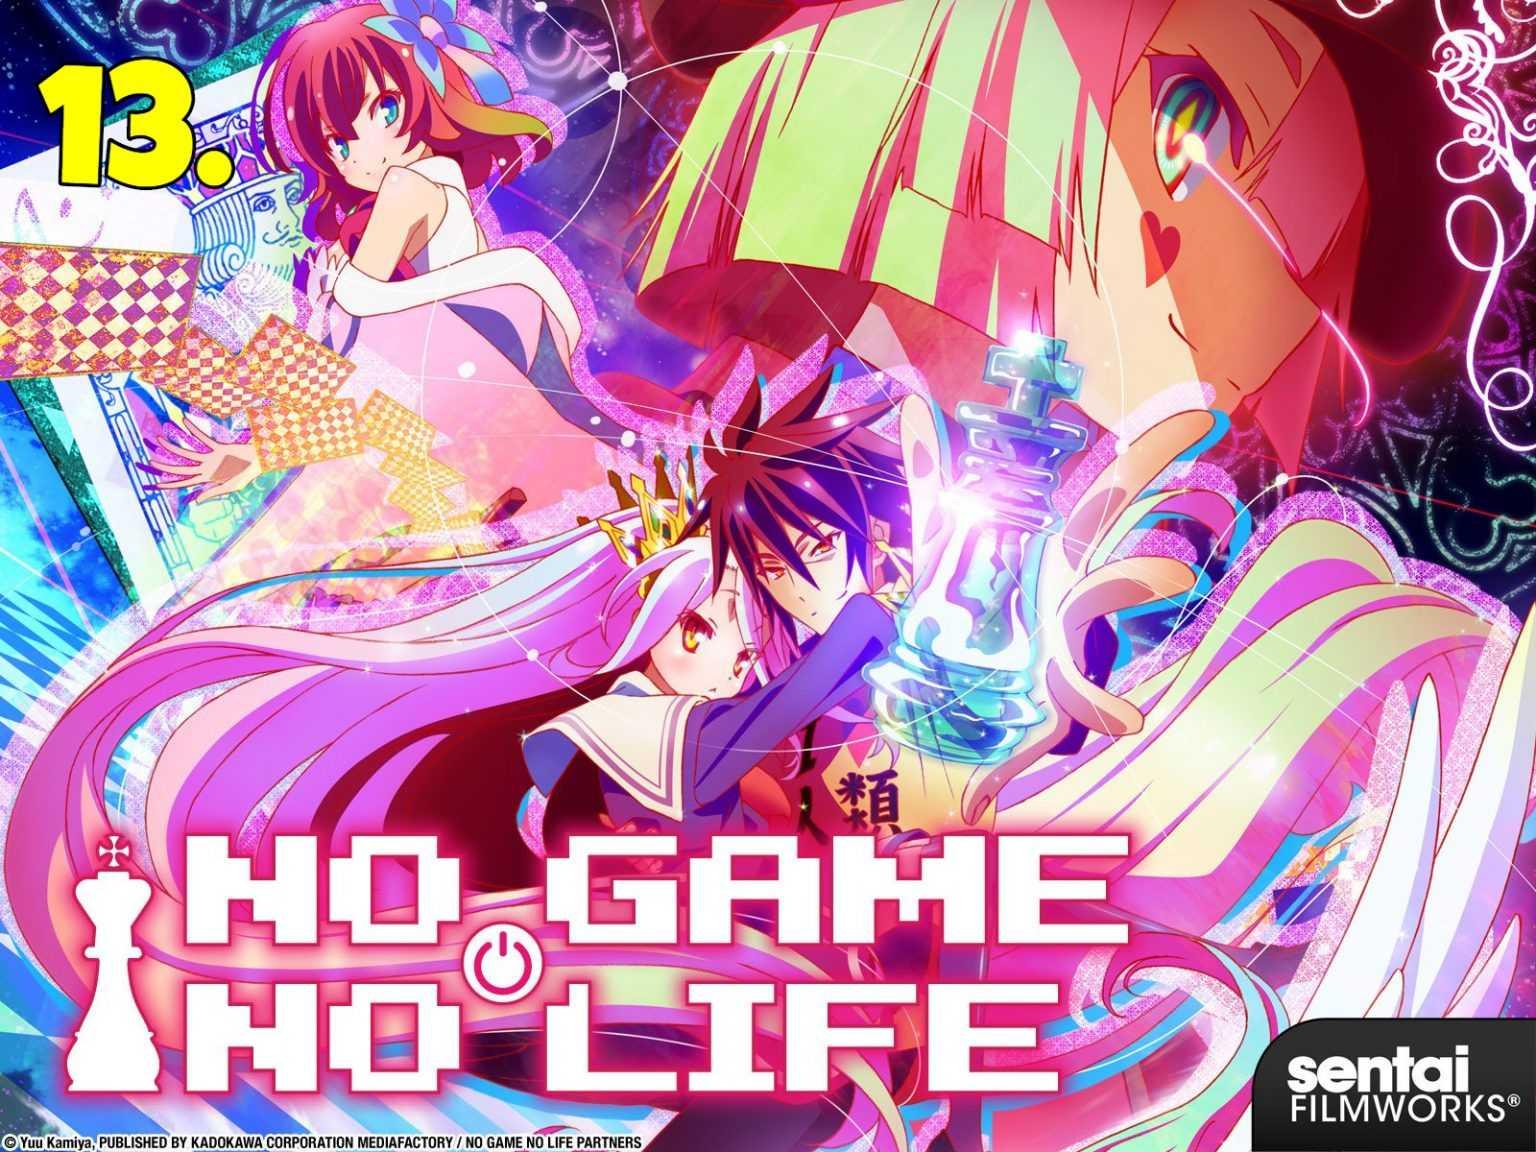 No-game-no-life